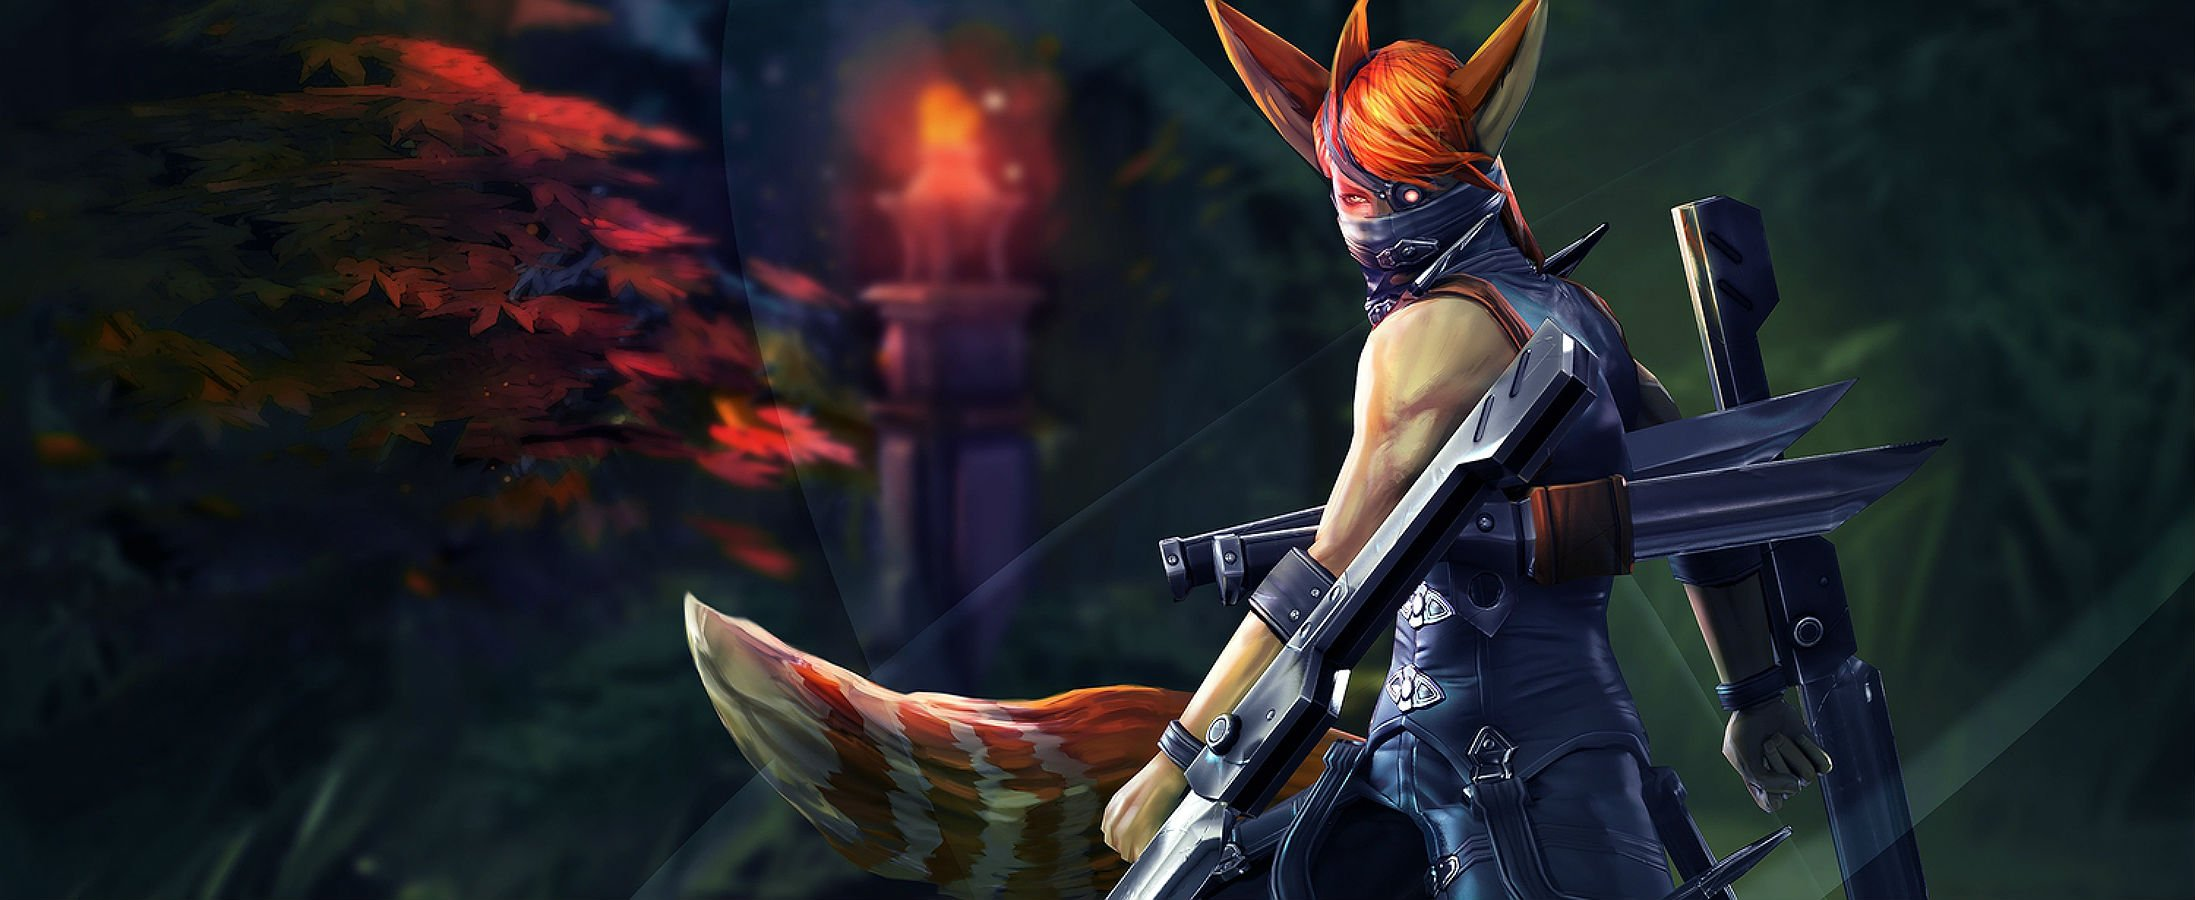 Hd wallpaper vainglory - Vainglory Moba Online Fighting Fantasy 1vainglory Warrior Action Wallpaper